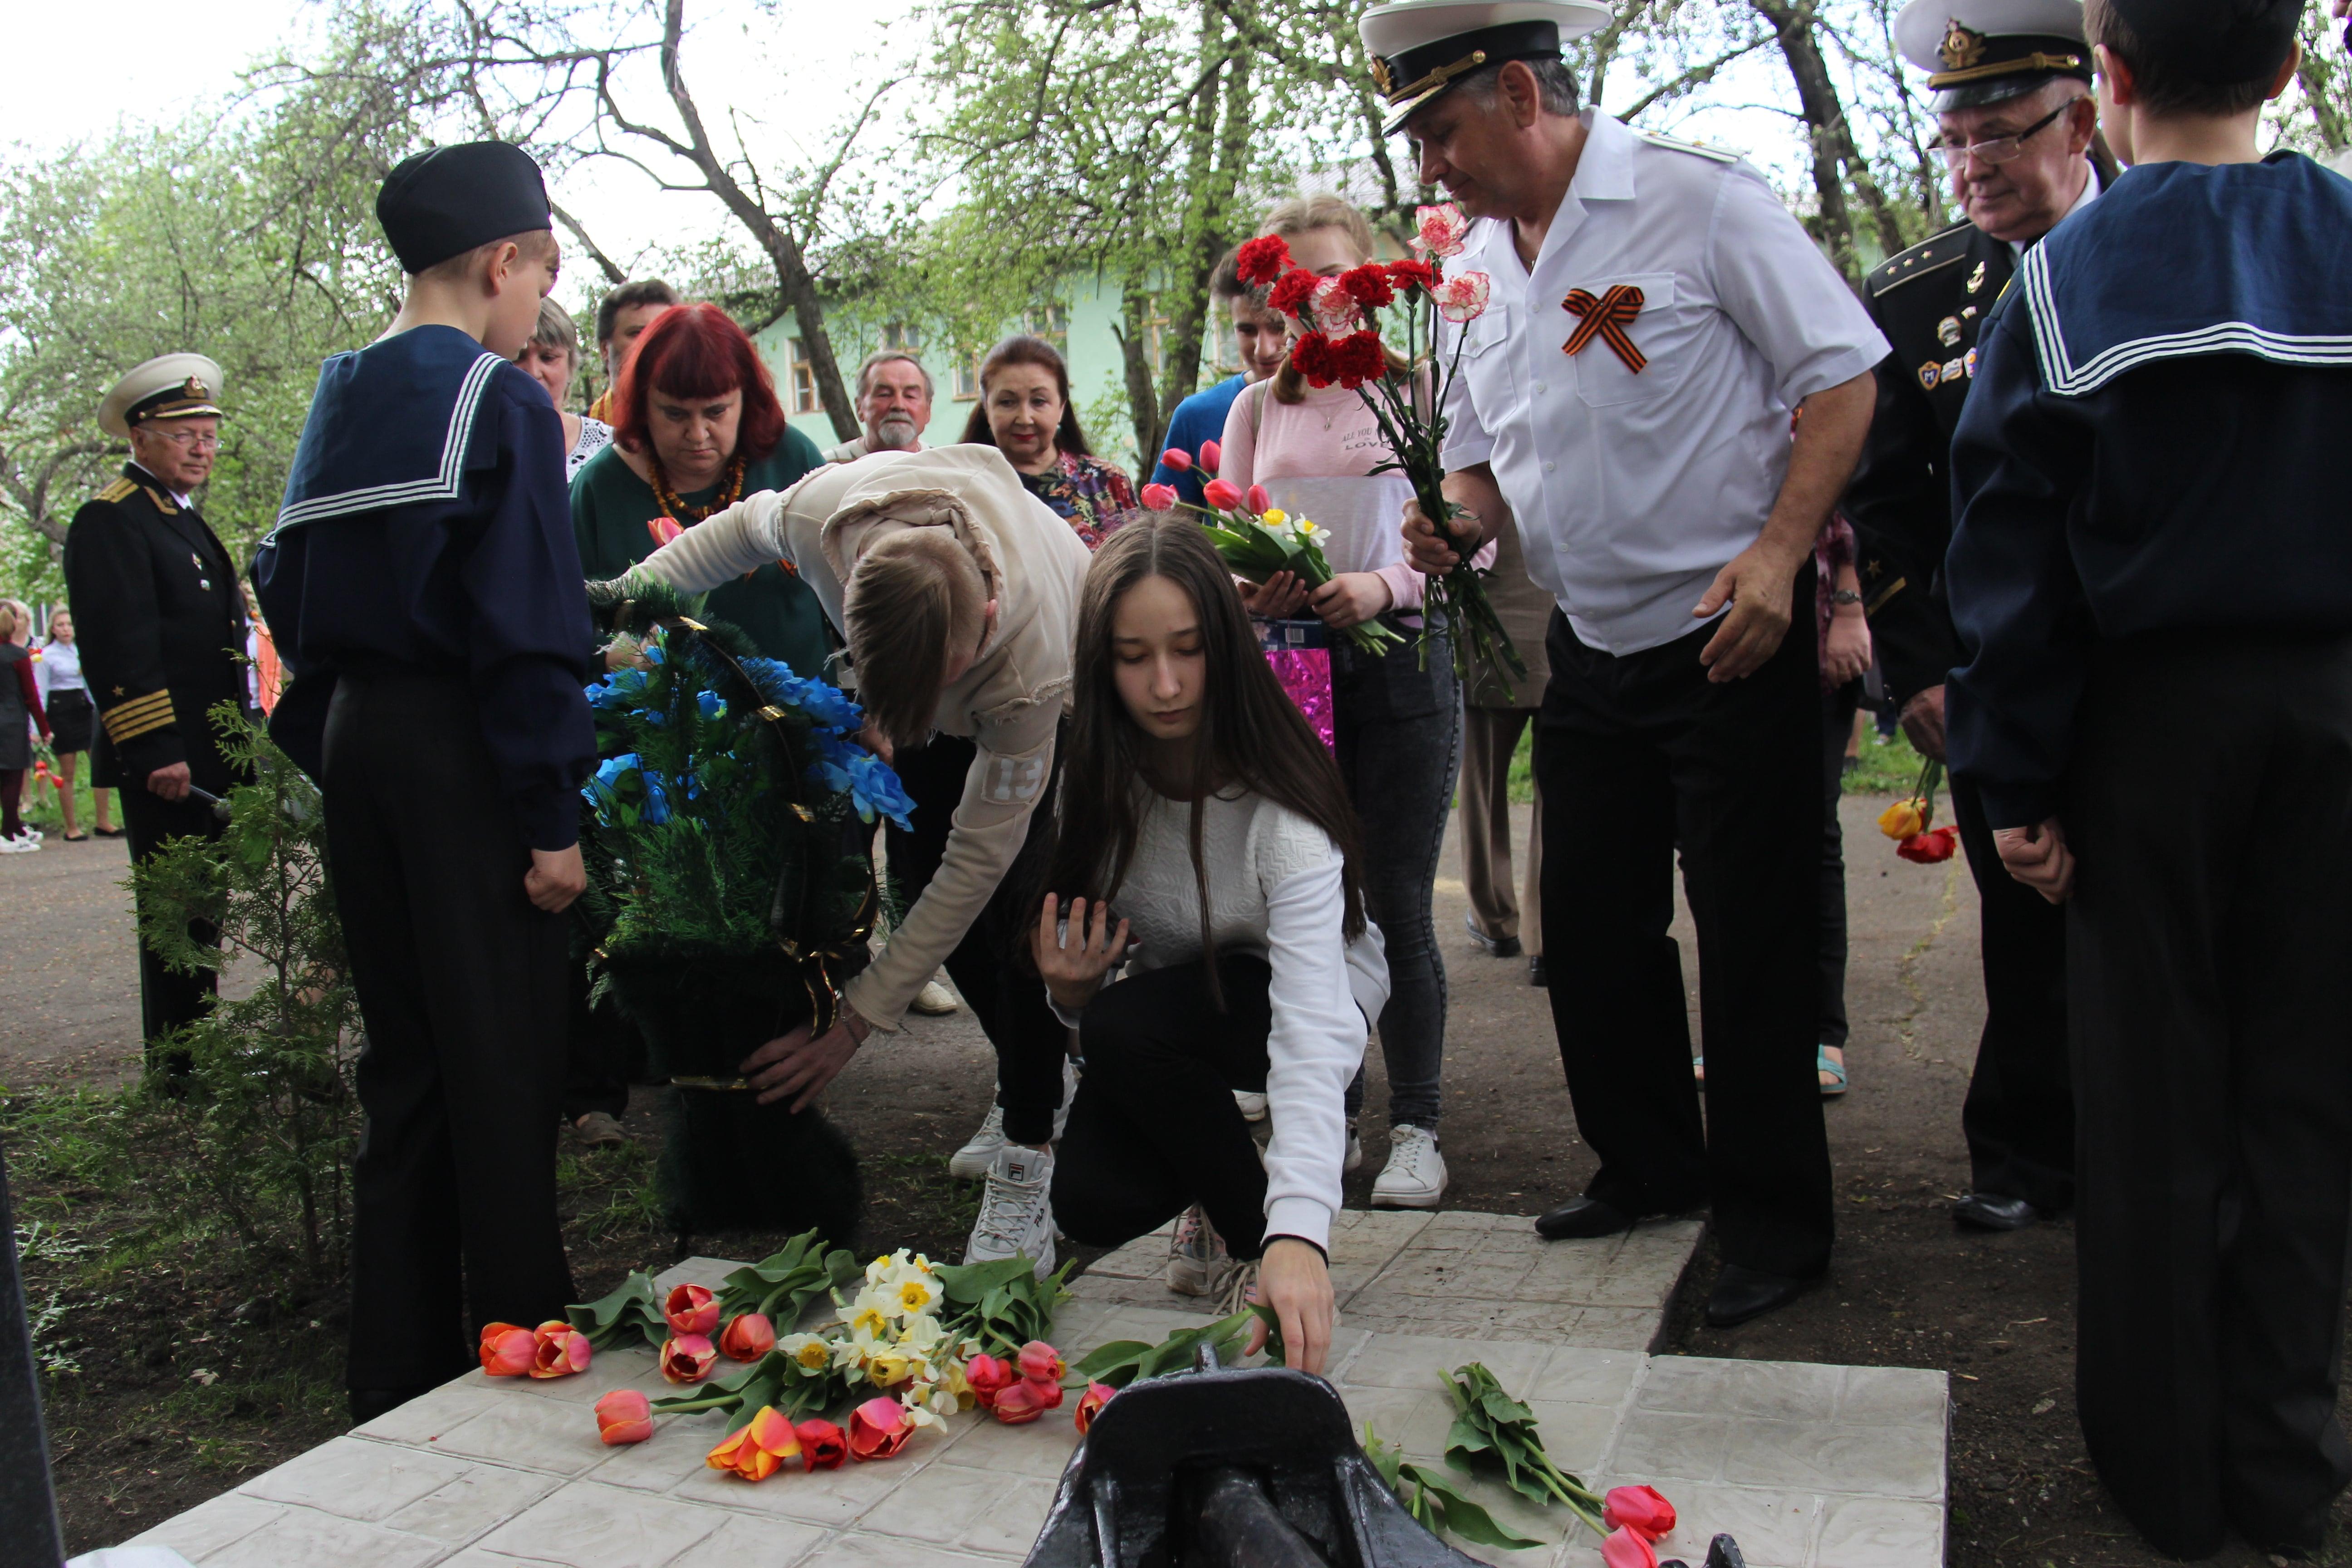 http://monuspen.ru/photoreports/b3afe9db7b5af7083492e2c5aff7c191.JPG